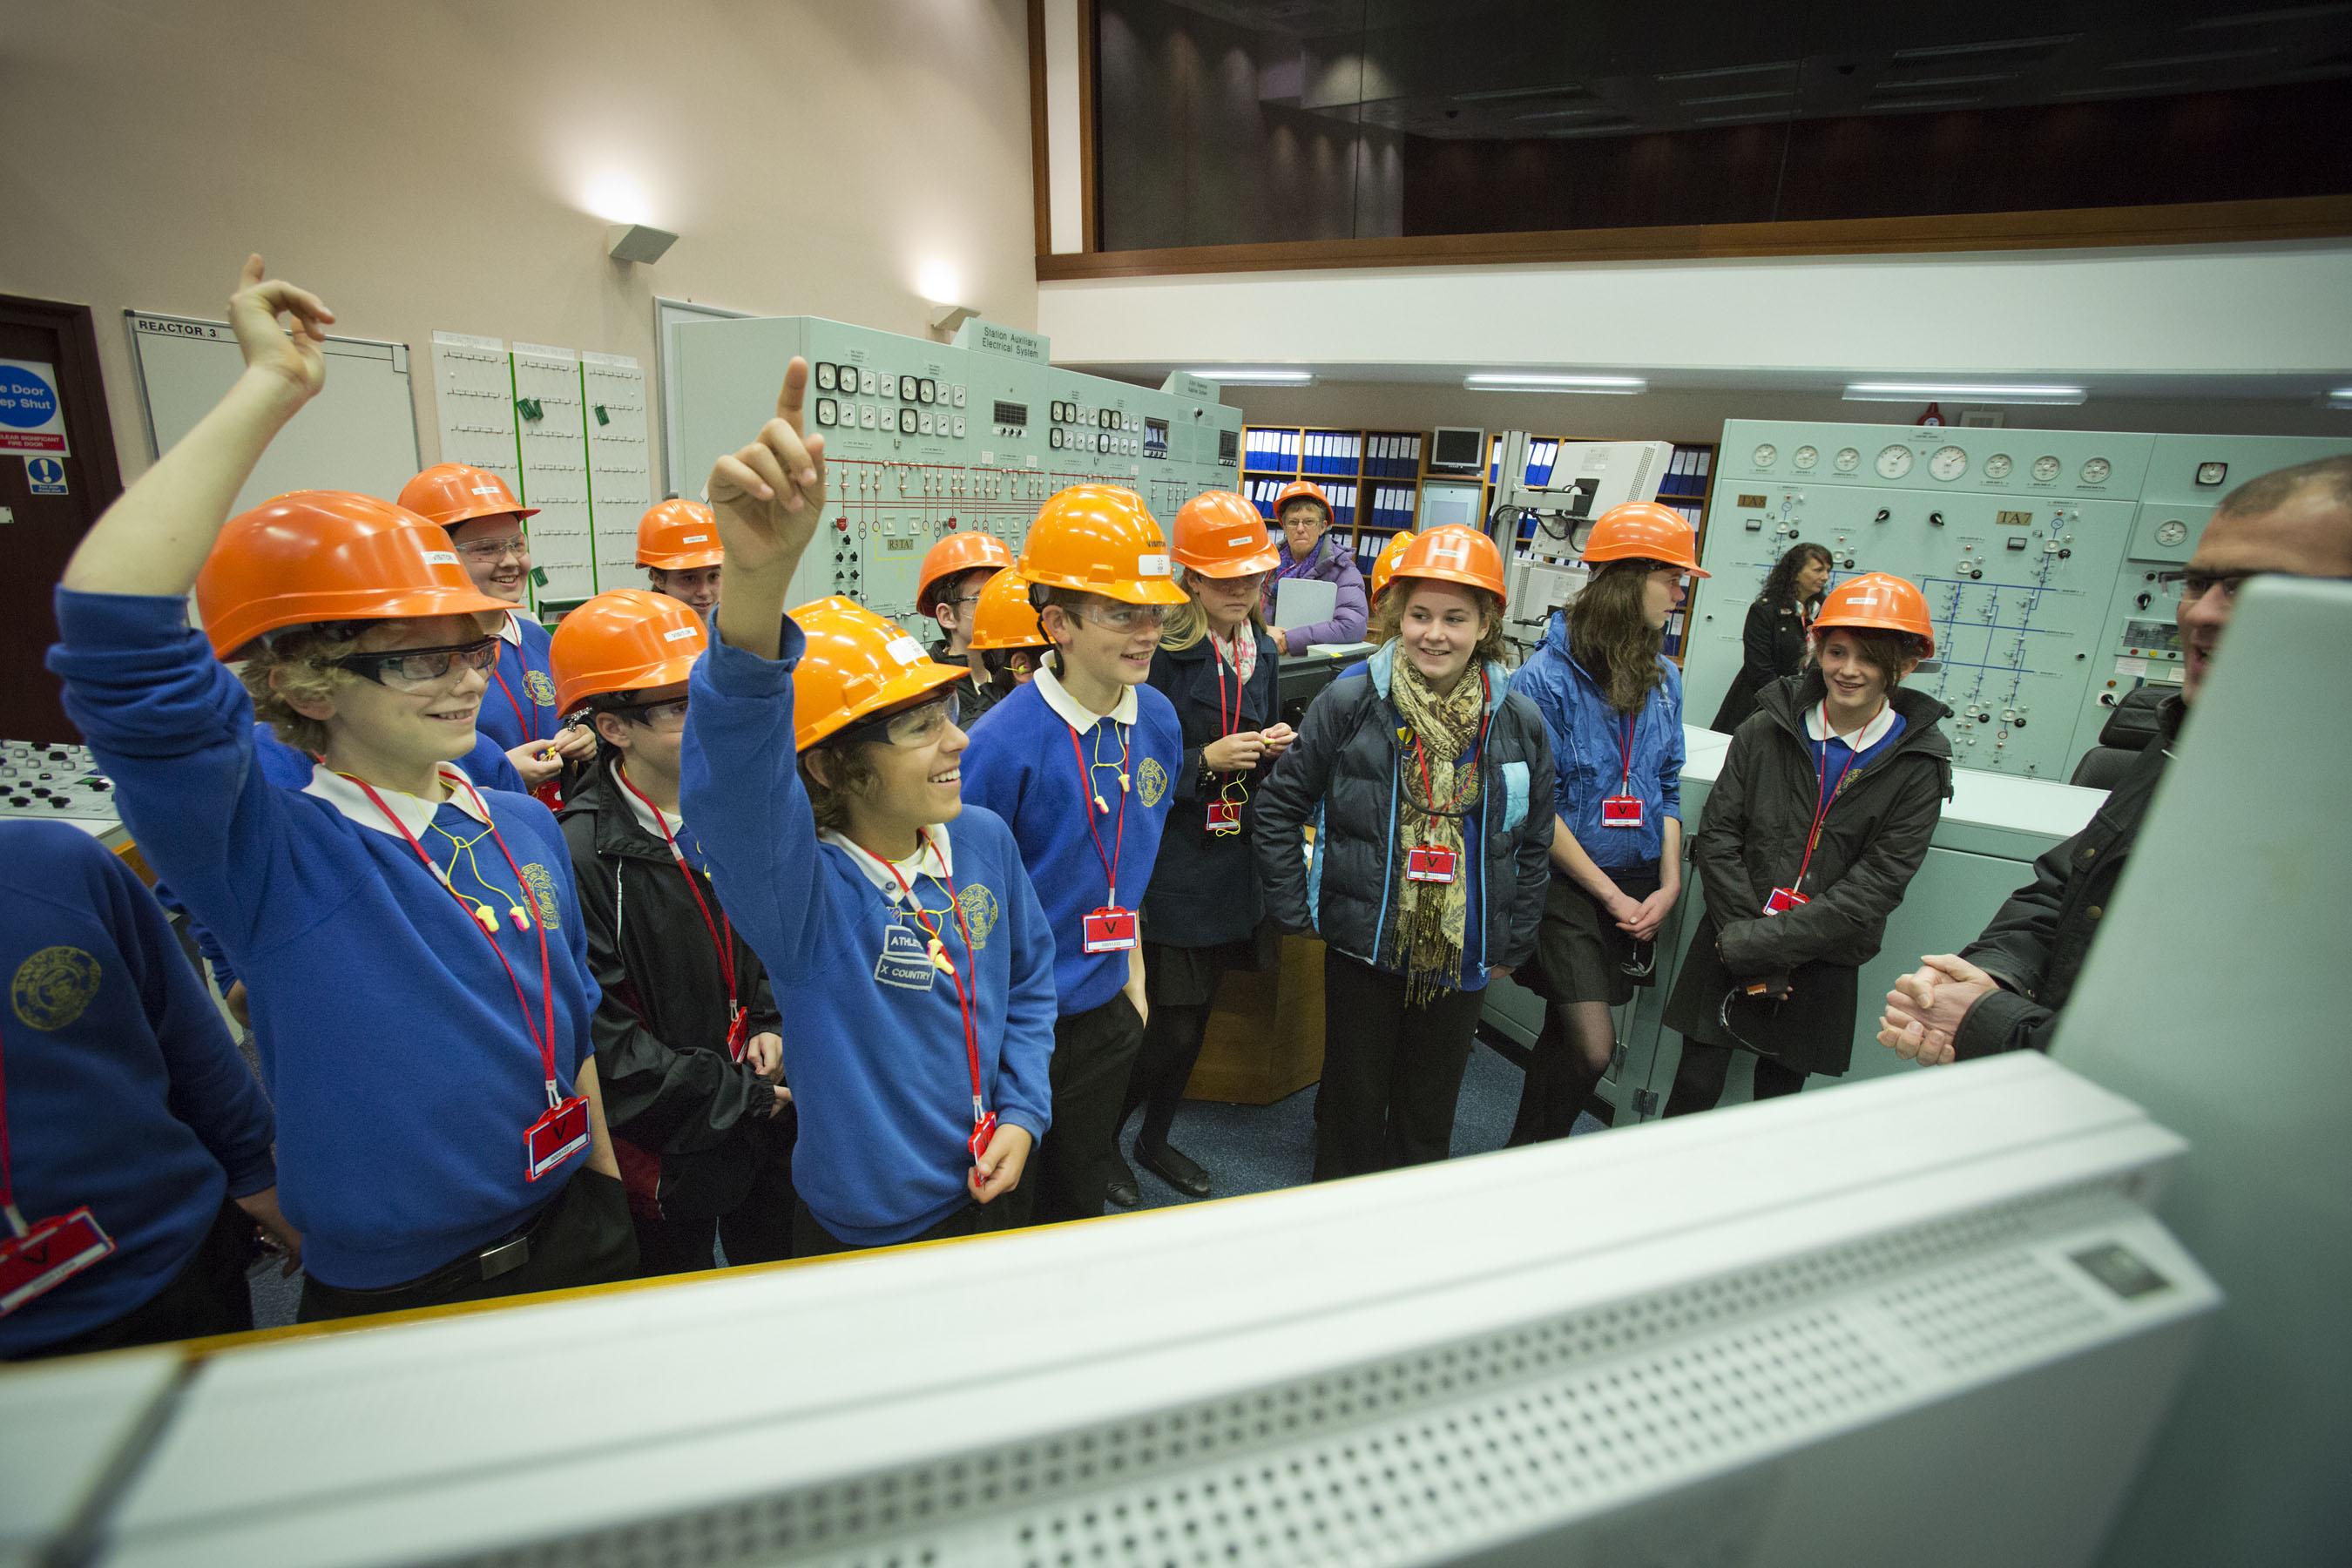 Schoolchildren in hard hats during a power station tour